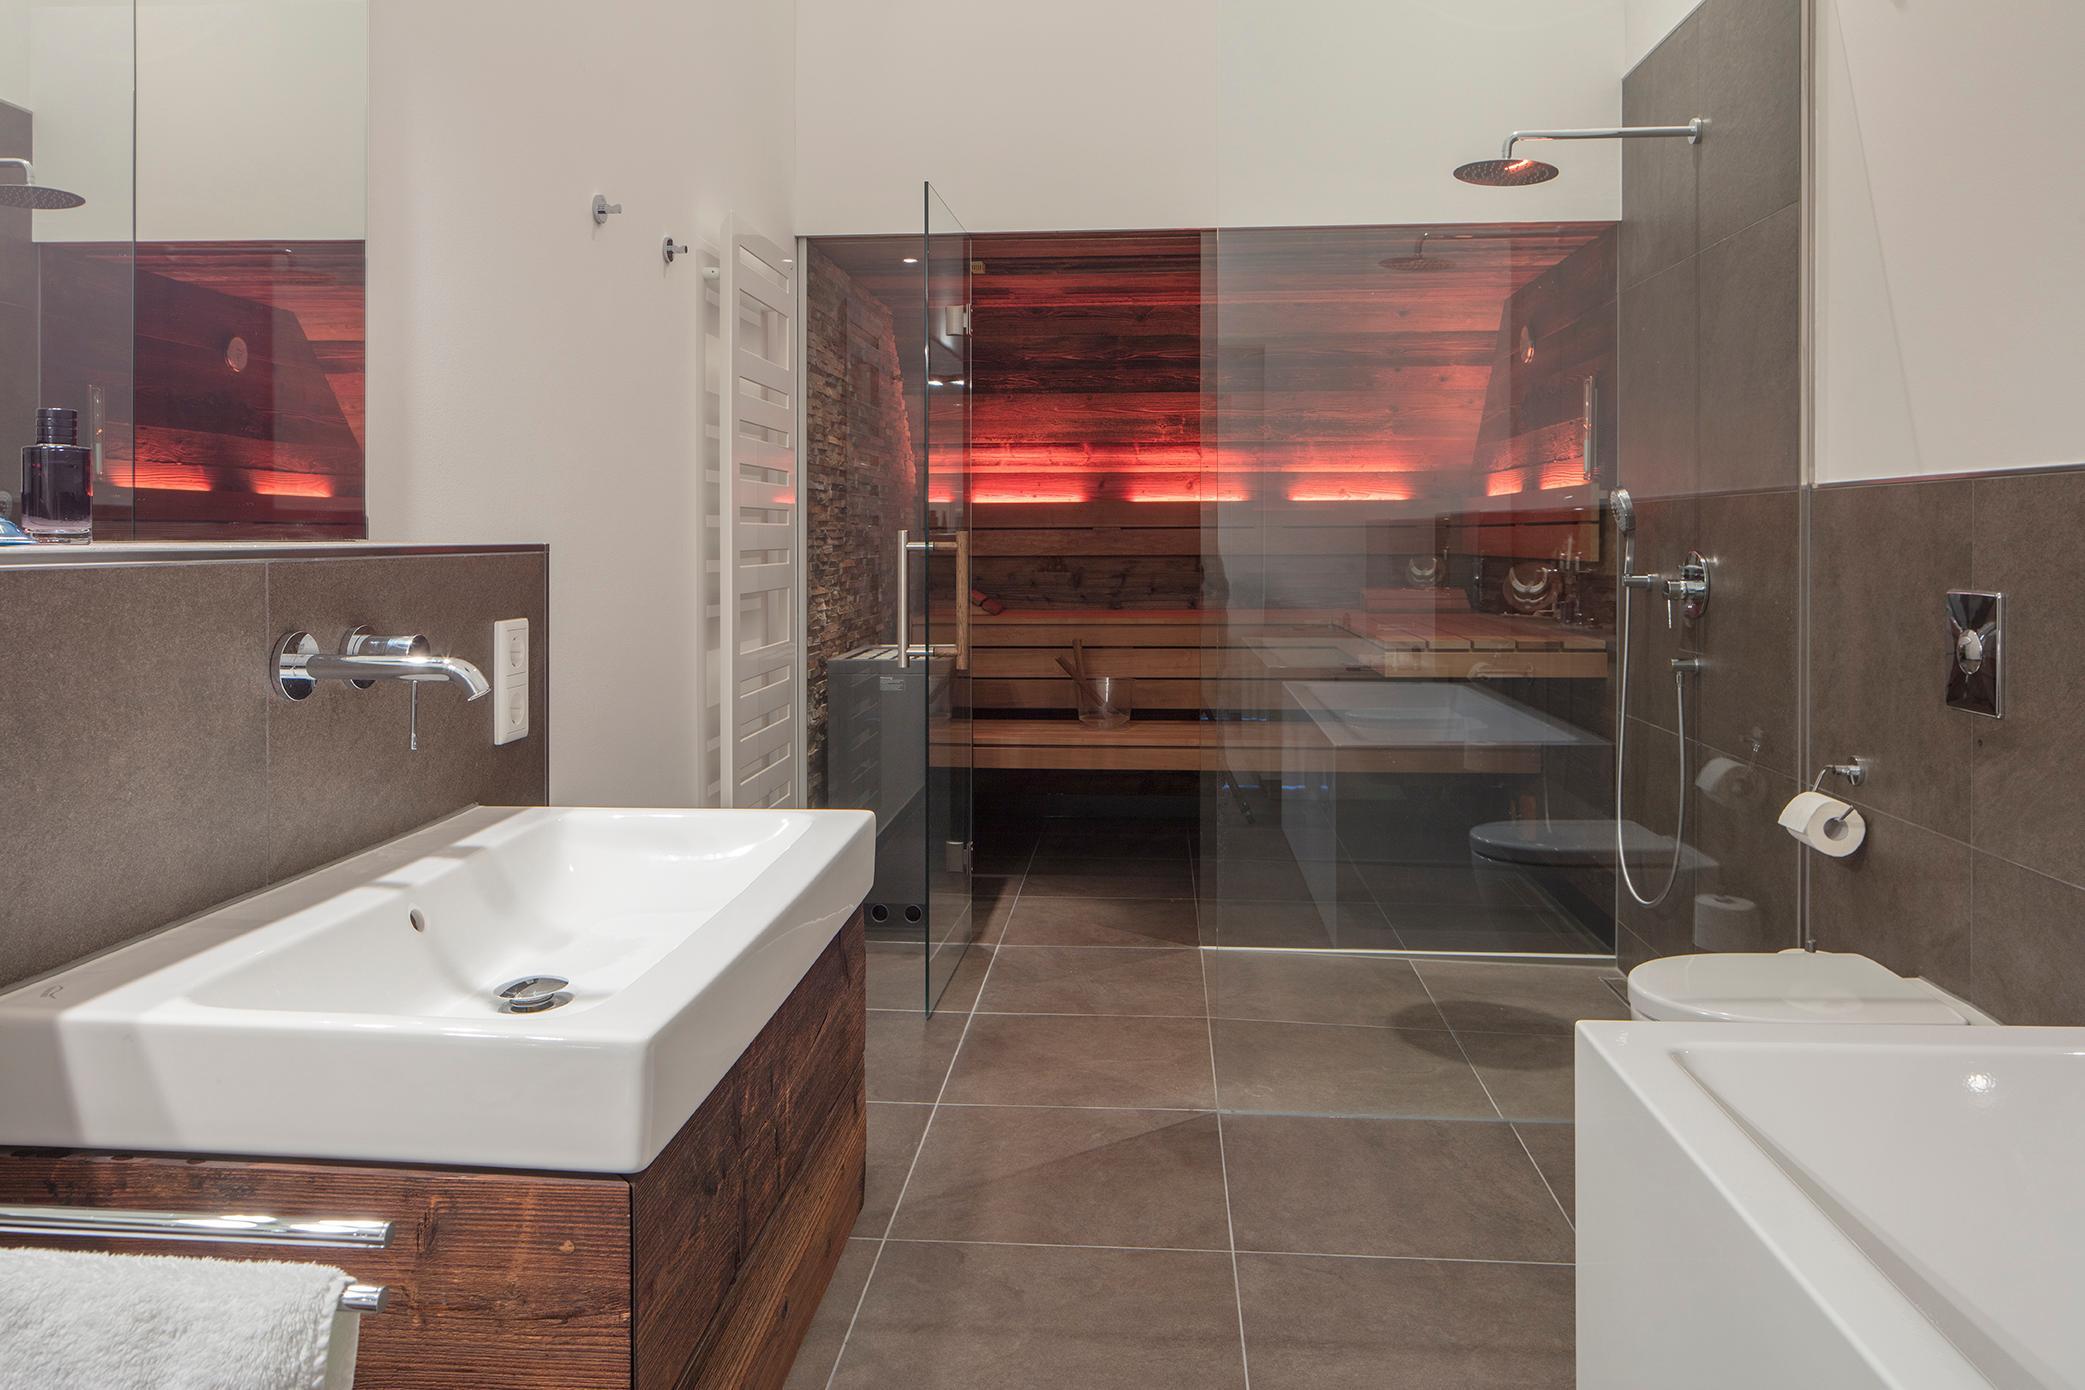 designsauna mit altholz sauna badsauna corso saun. Black Bedroom Furniture Sets. Home Design Ideas